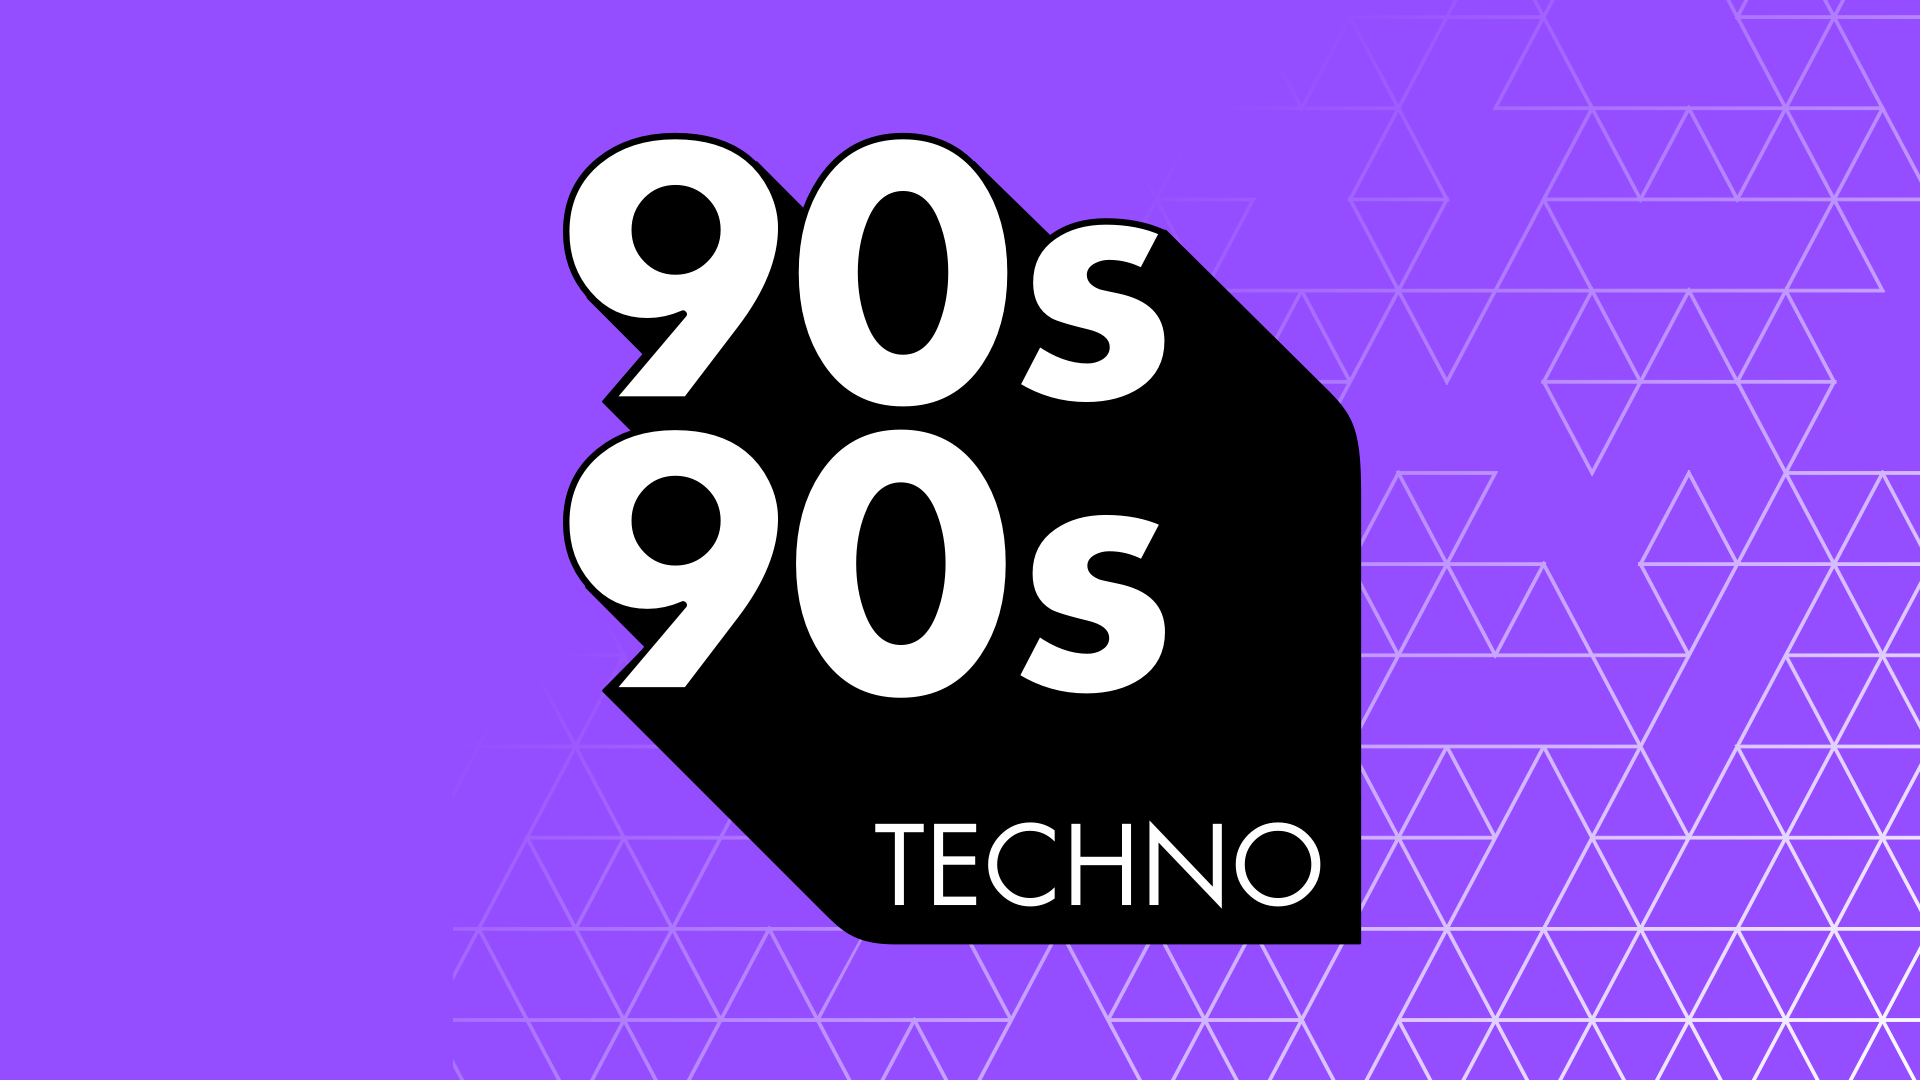 90s90s Techno